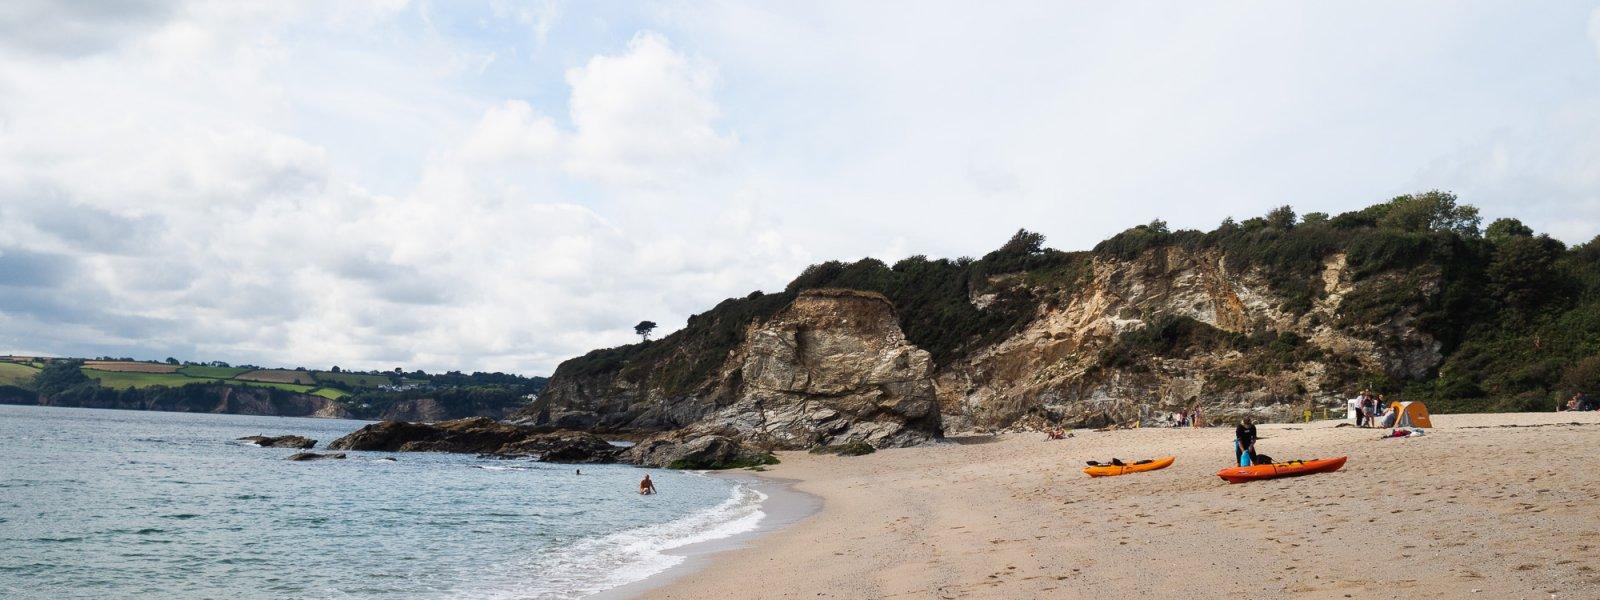 An Afternoon at Carlyon Beach (+ Cornwall Waverunner Jet Ski Safari!)